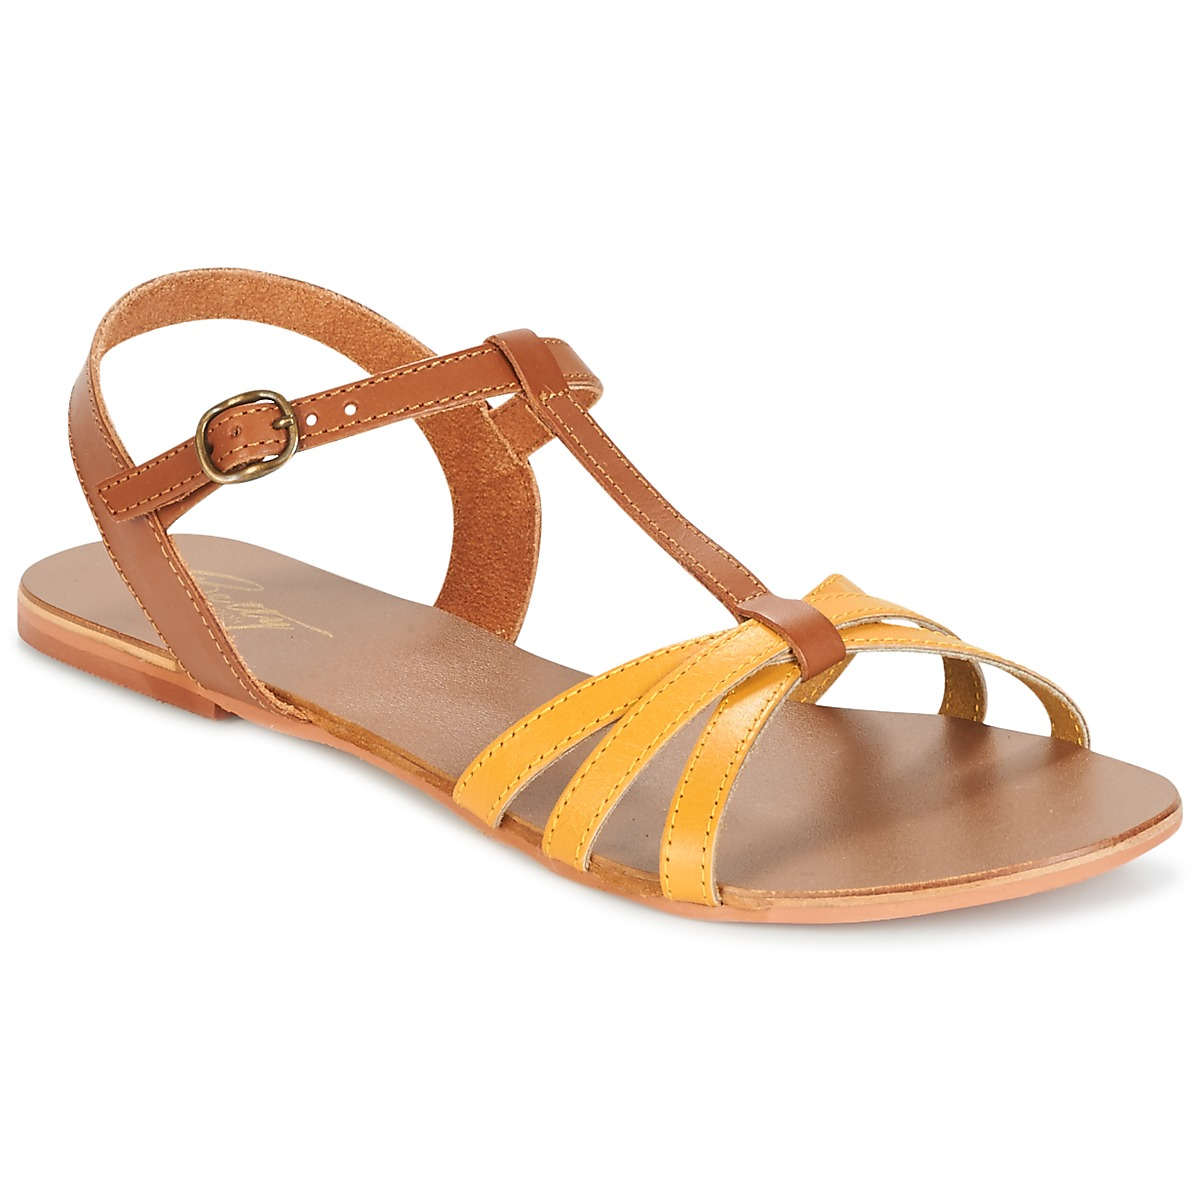 Sandals BT London IXADOL Yellow / CAMEL